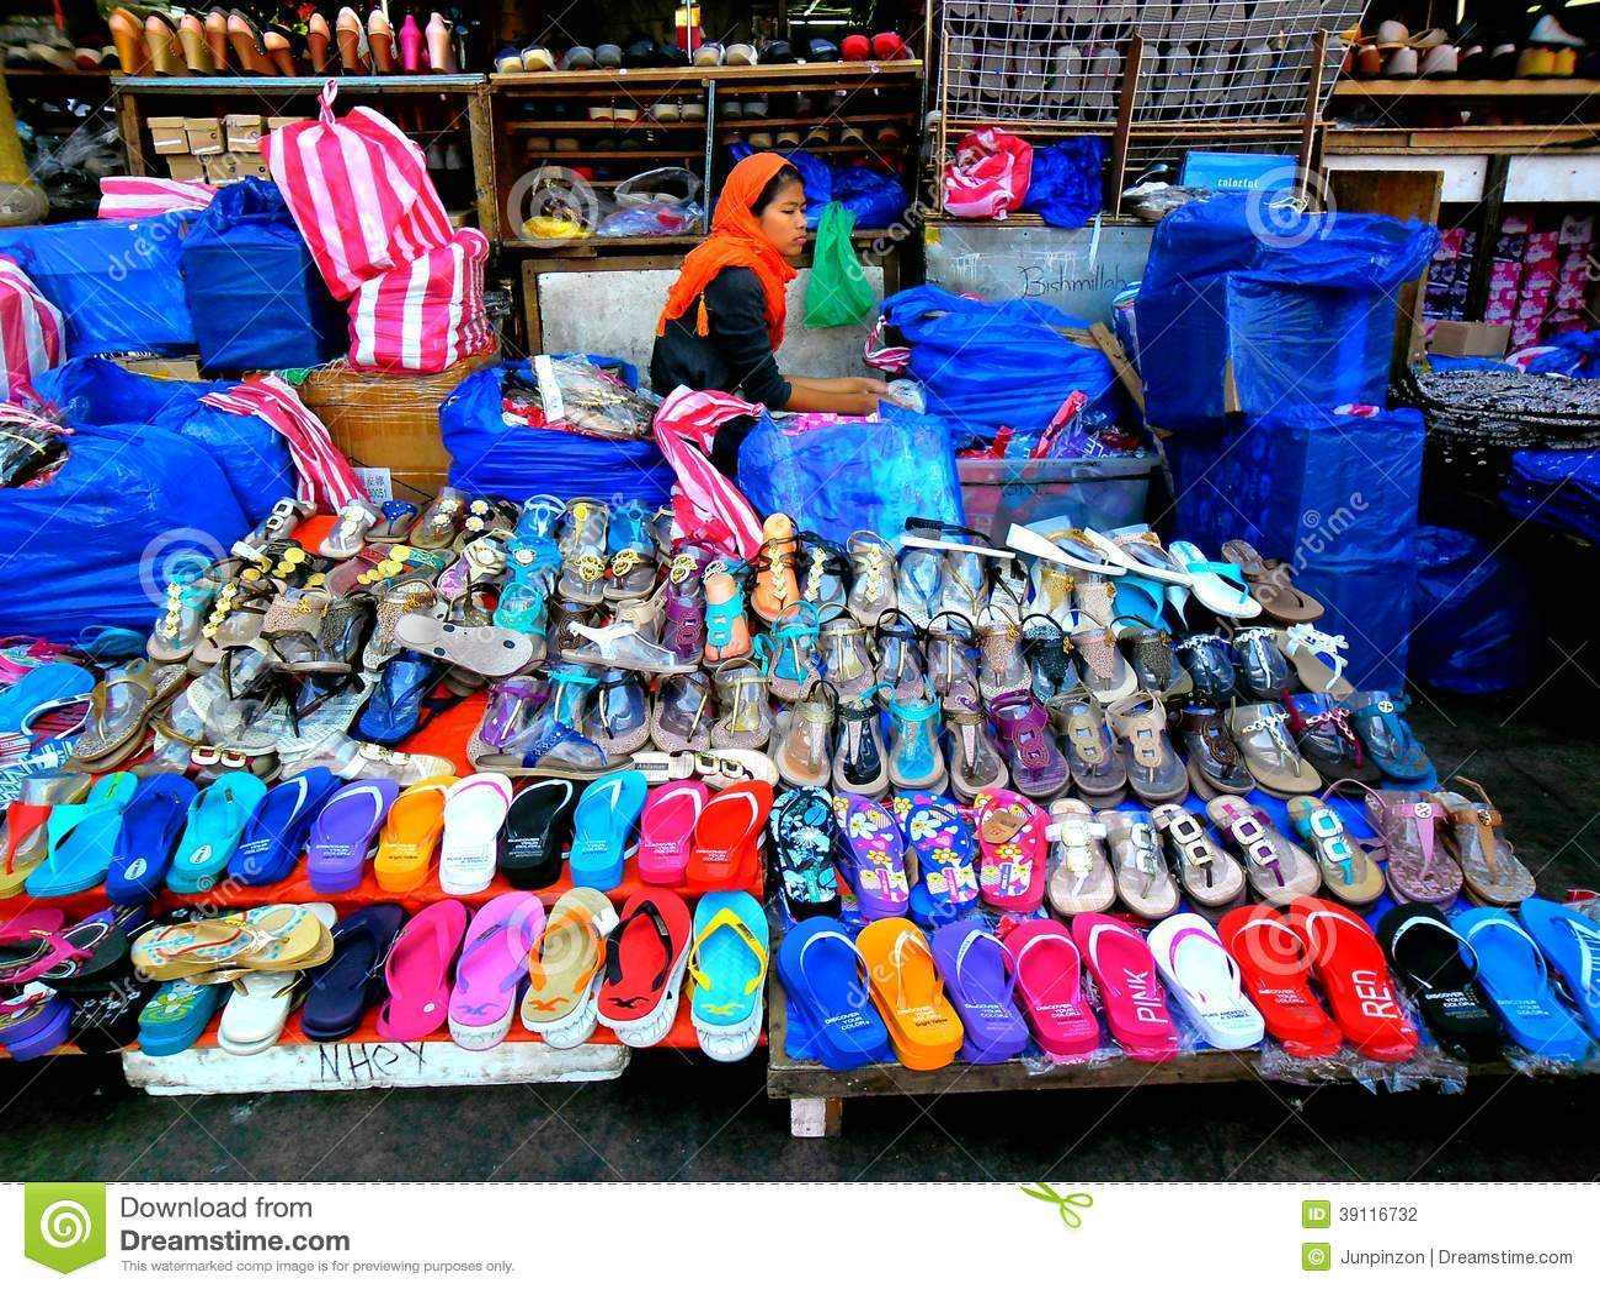 Straatventer verkopende pantoffels